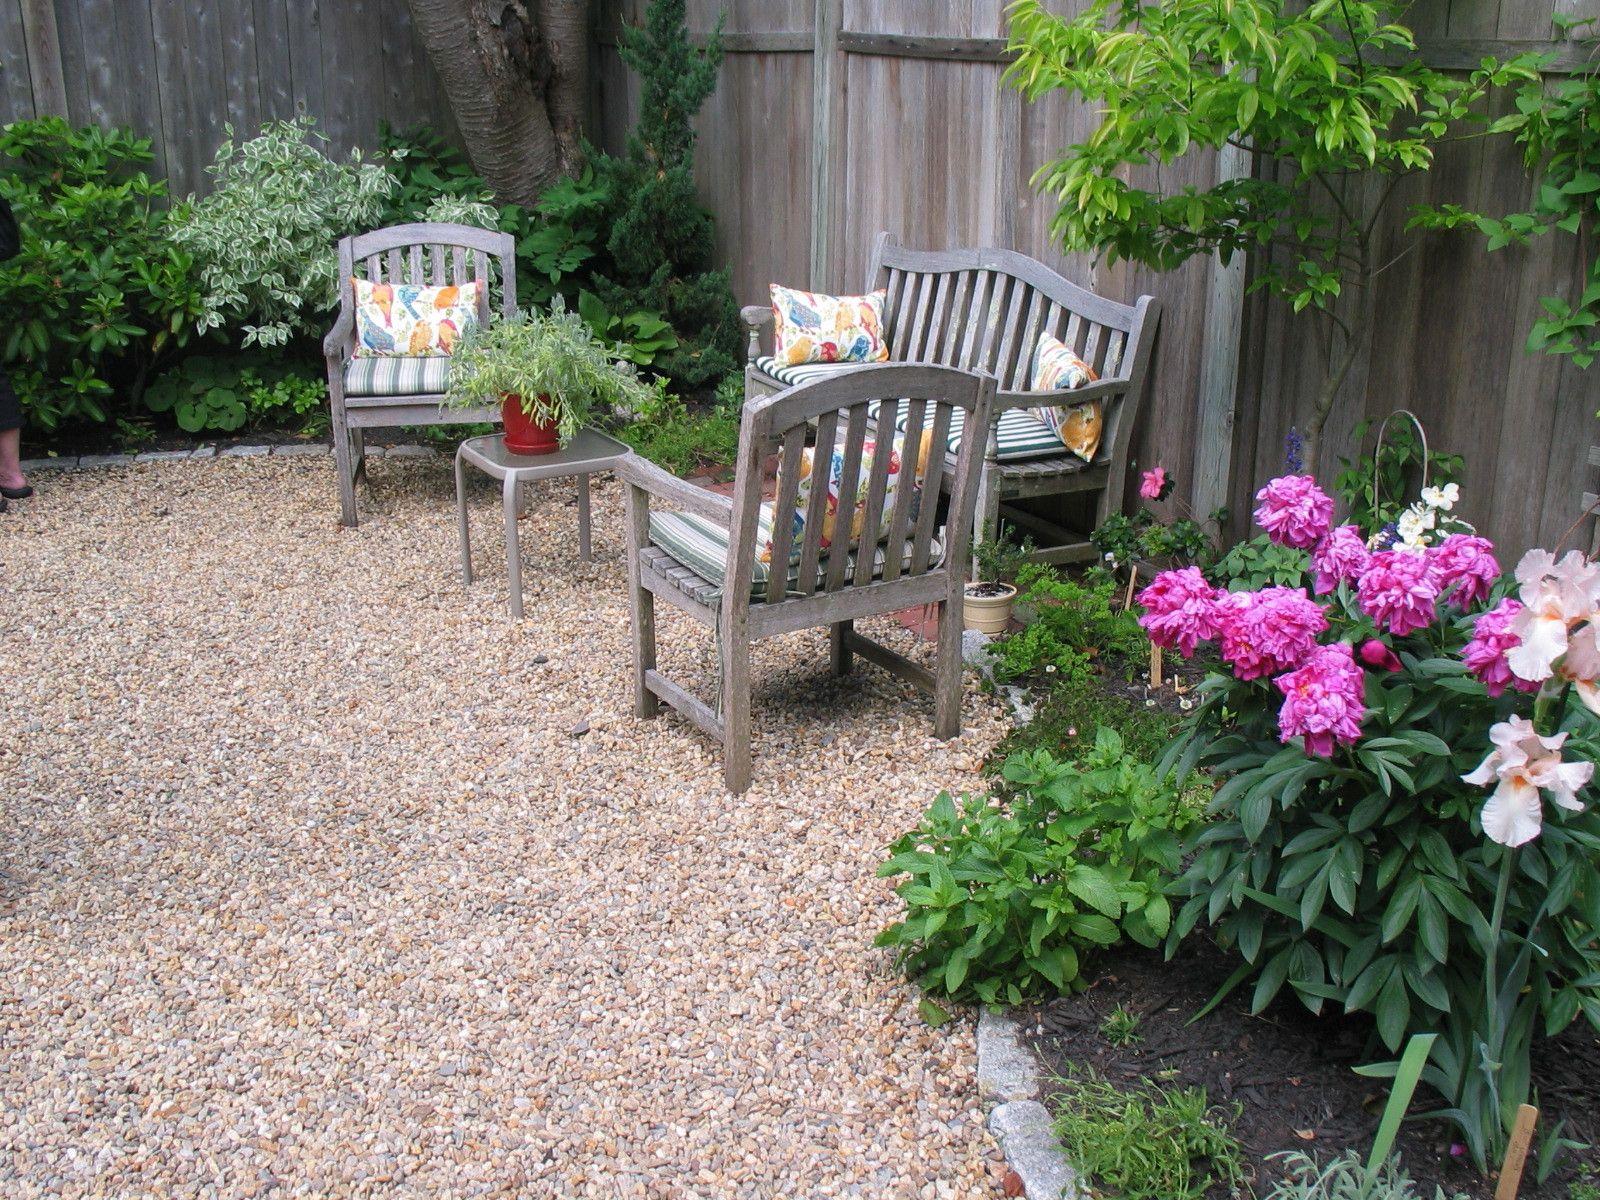 gartengestaltung mit kies - blickfang und kaum pflege - garten, Garten ideen